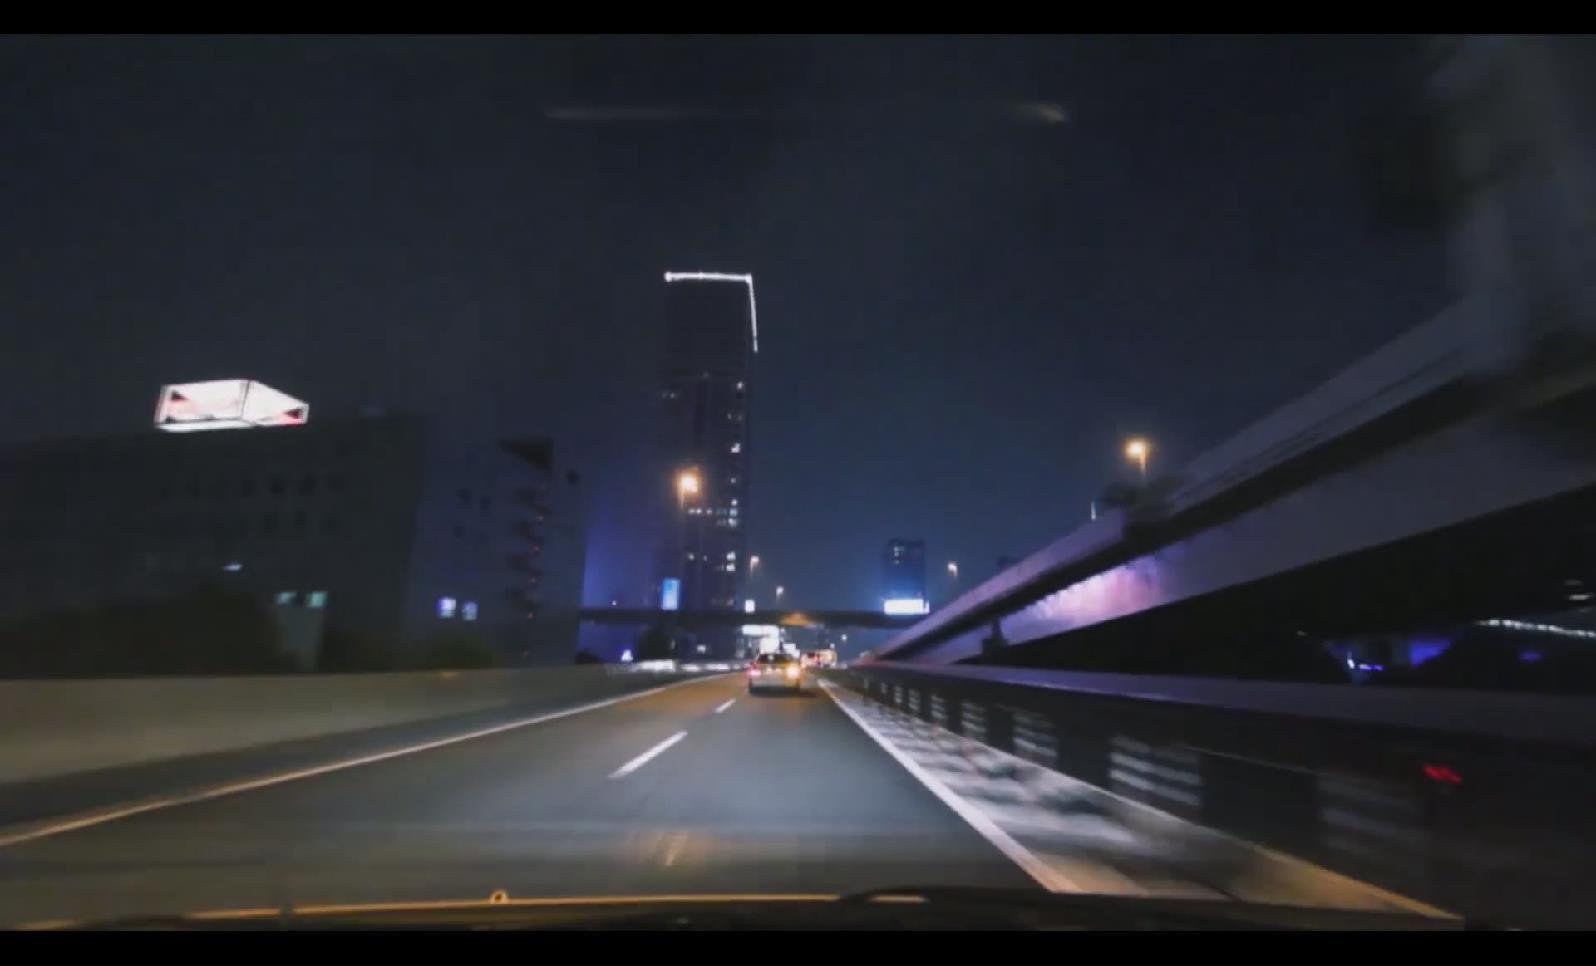 CS 05 驾车夜晚隧道开车穿梭